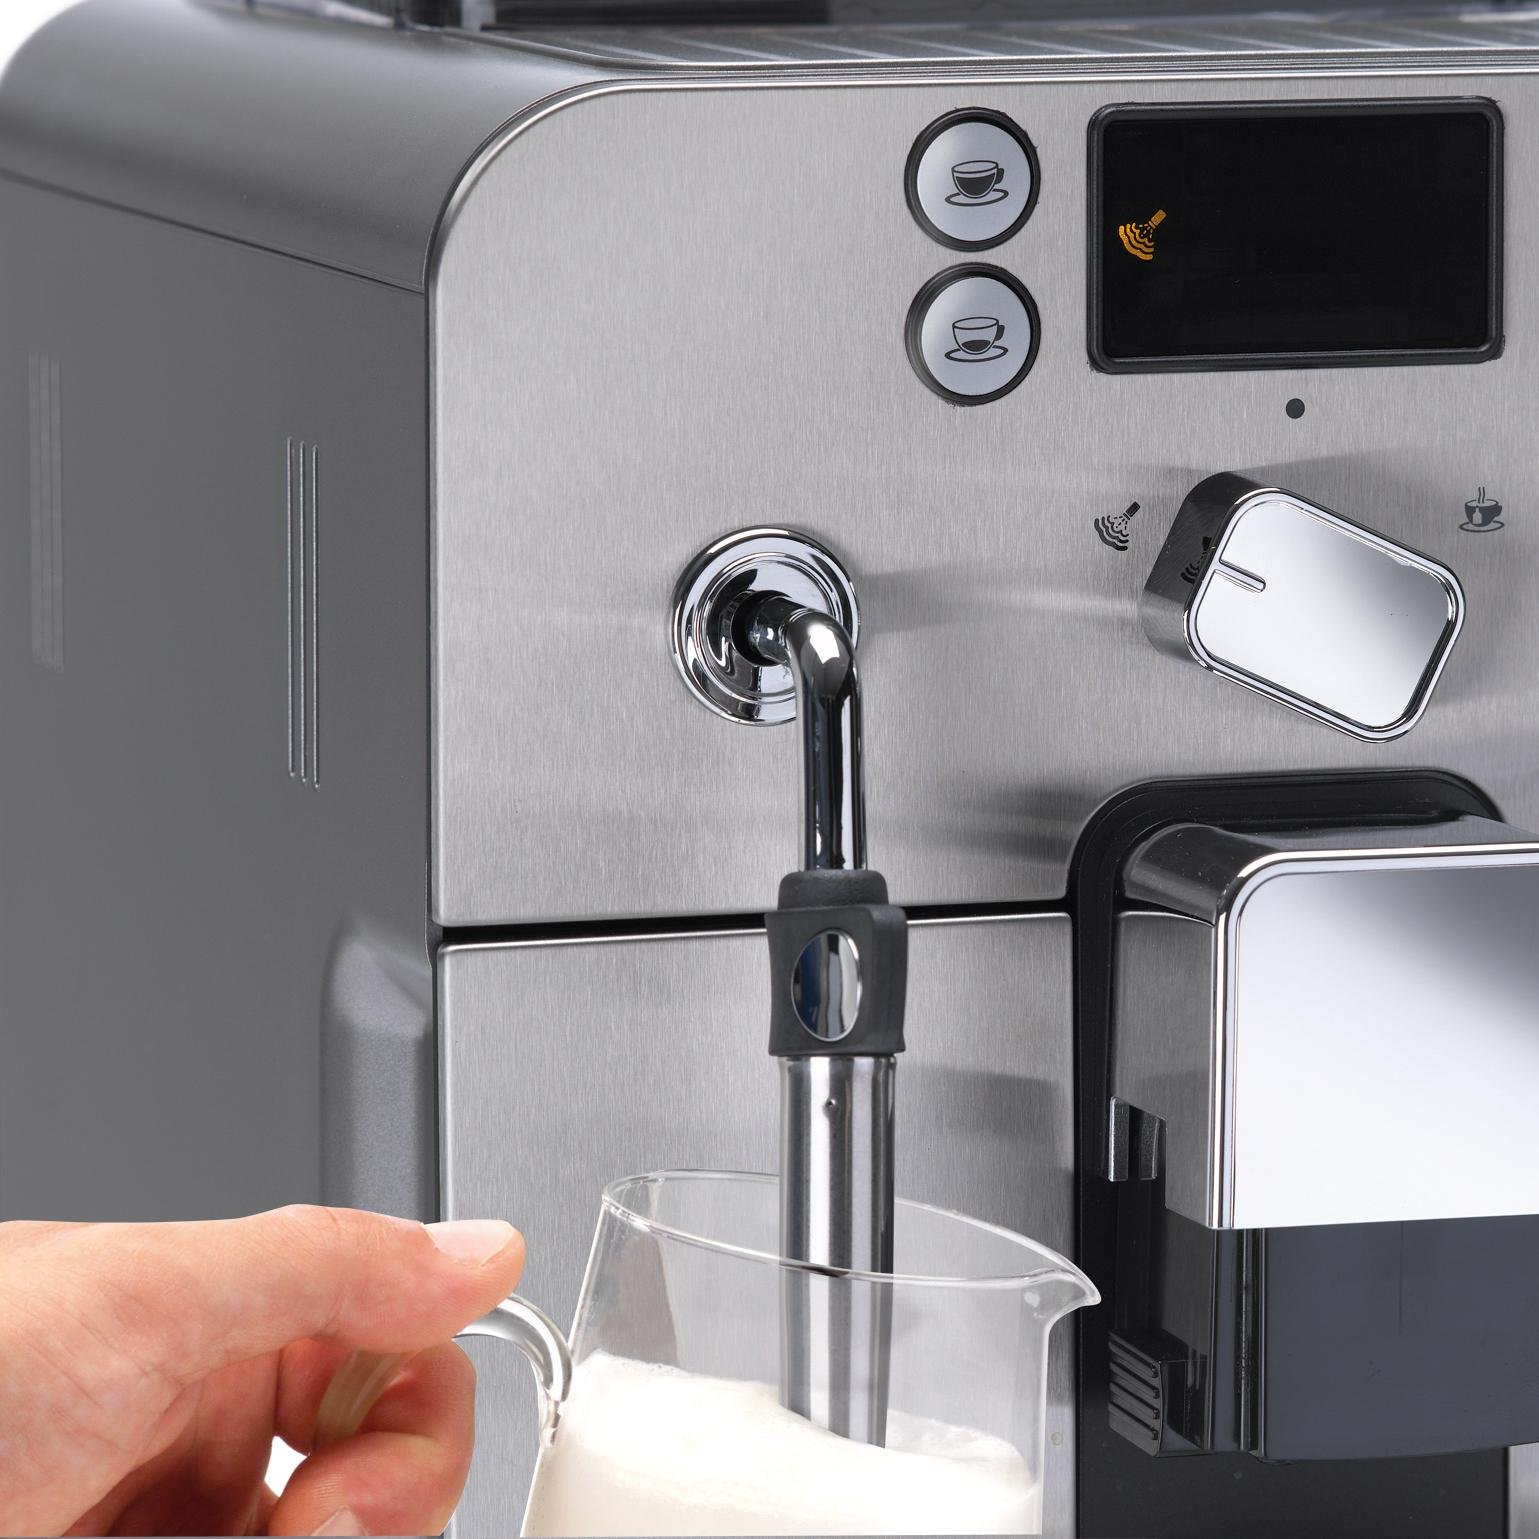 Gaggia Brera Super Automatic Espresso Machine in Silver. Pannarello Wand Frothing for Latte and Cappuccino Drinks. Espresso from Pre-Ground or Whole Bean Coffee. by Gaggia (Image #5)